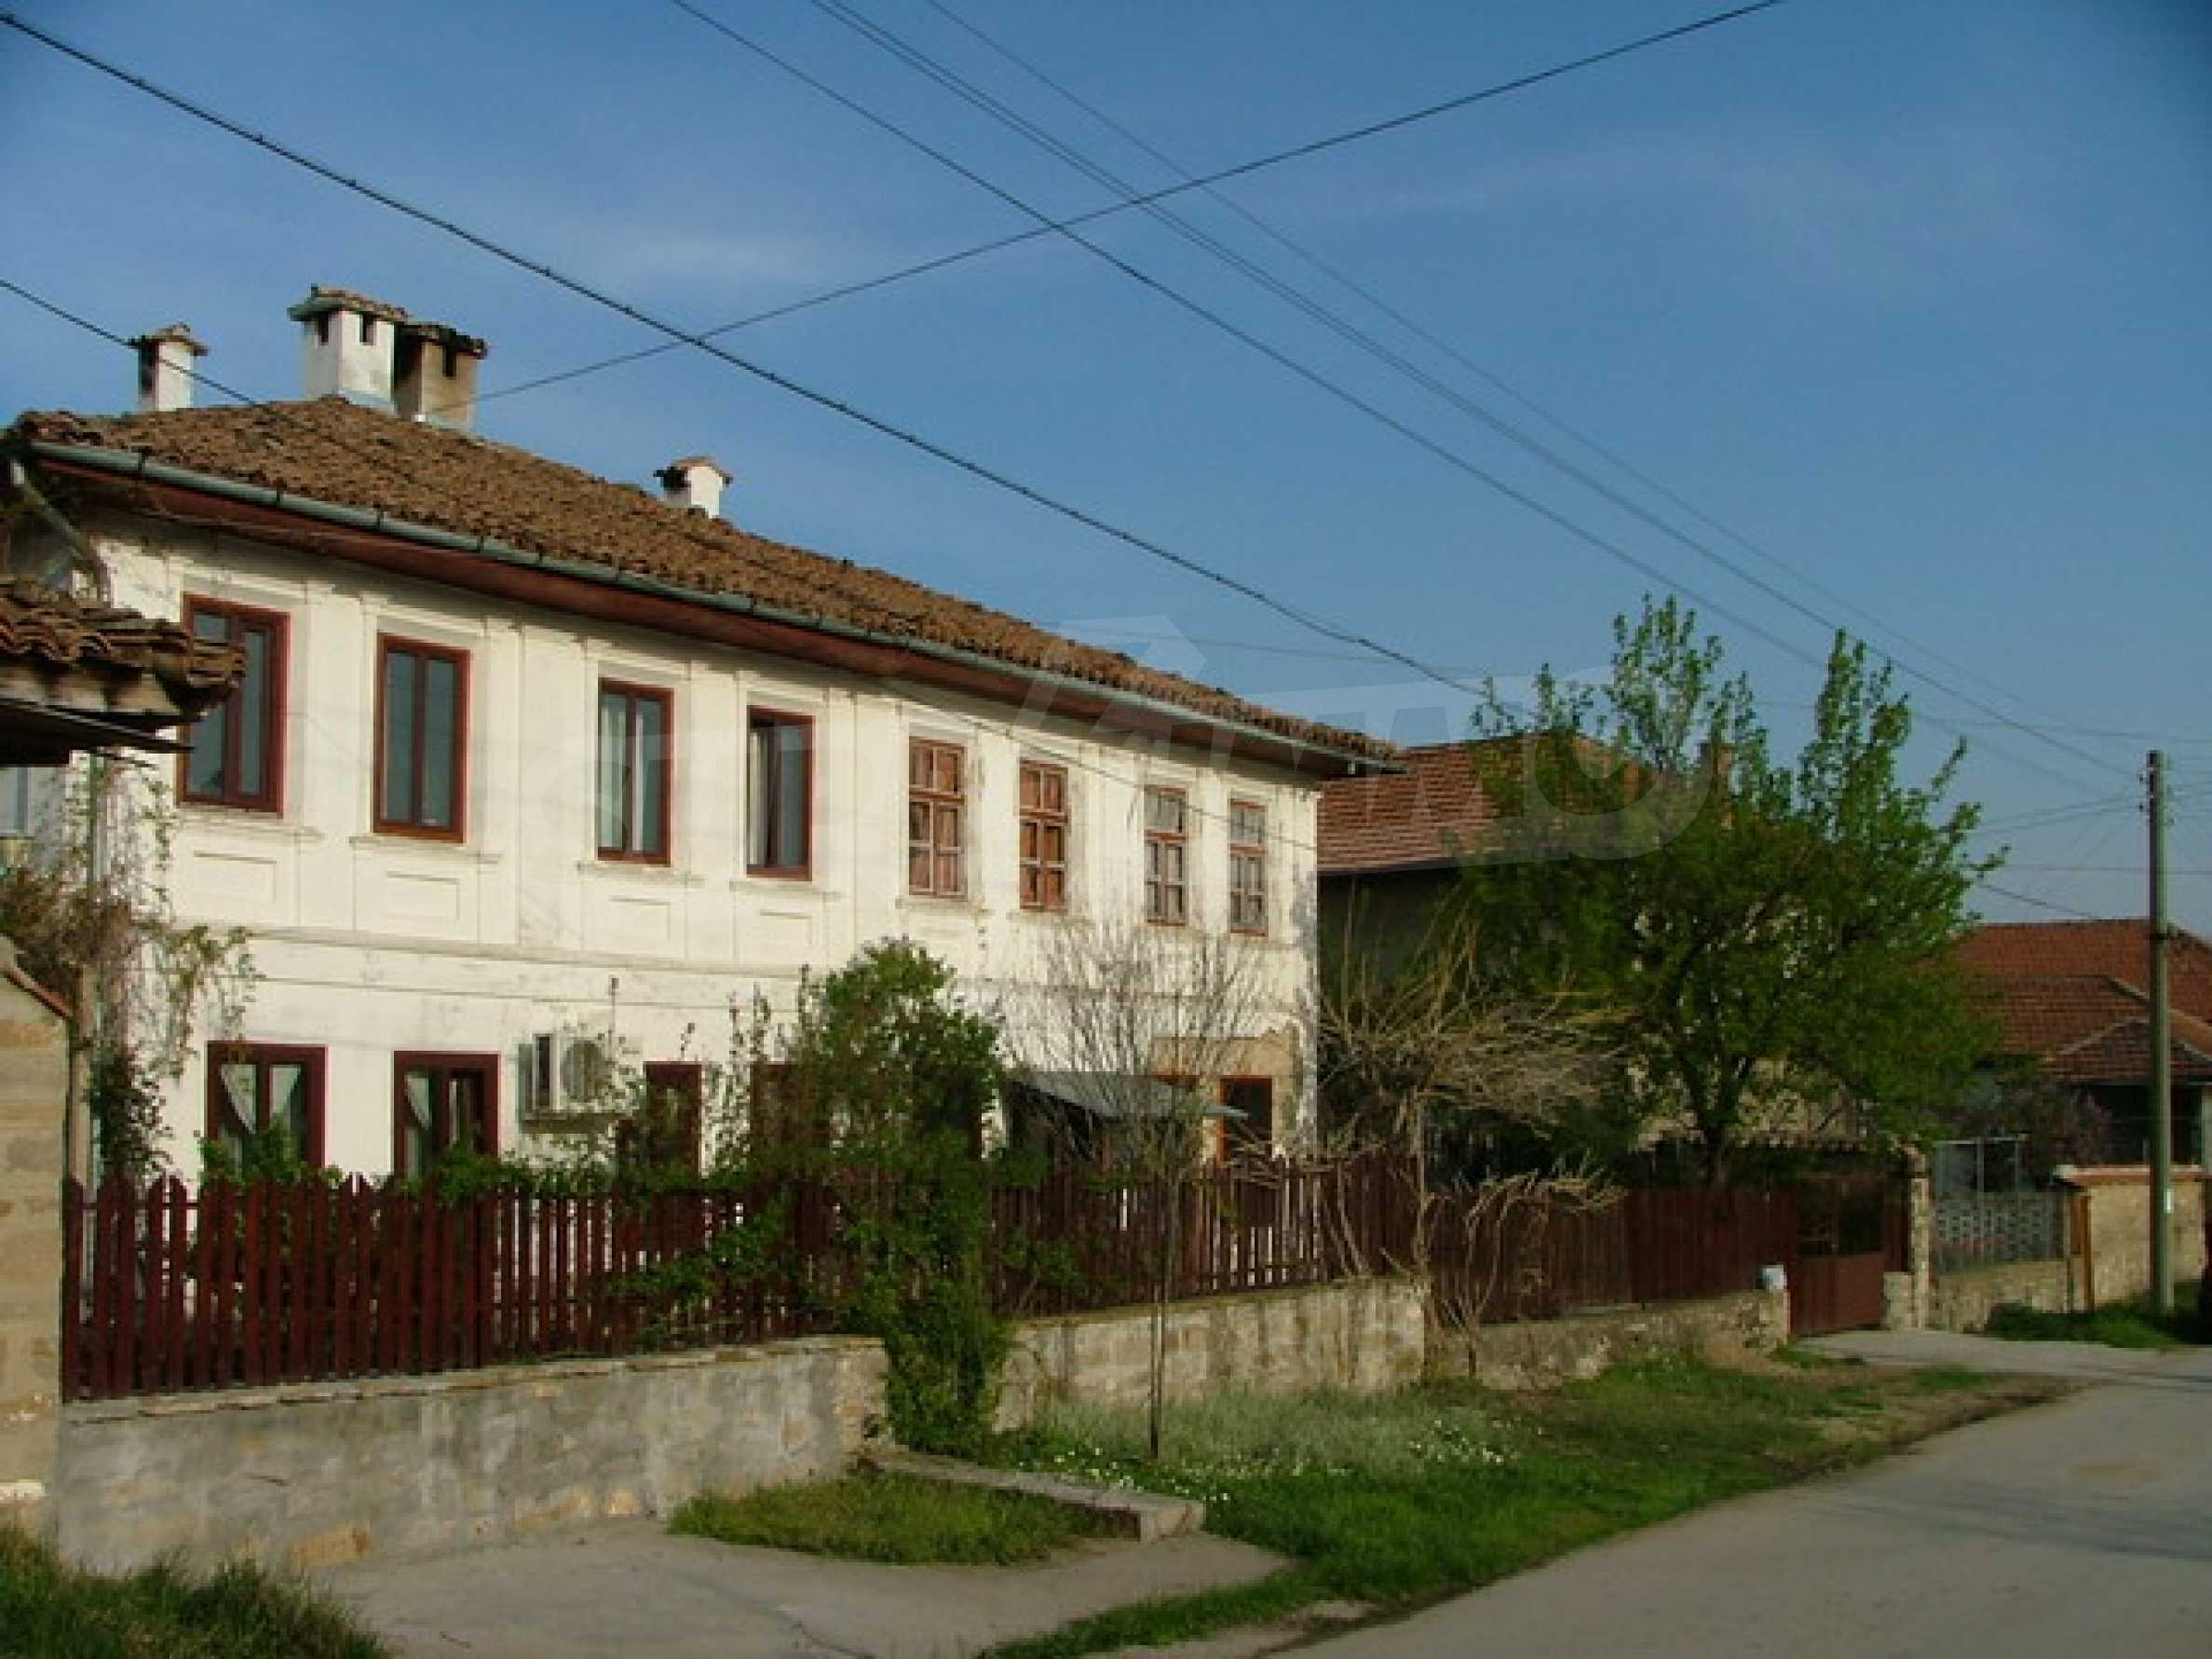 Stilvoll renovierte Villa 12 km entfernt. von Veliko Tarnovo